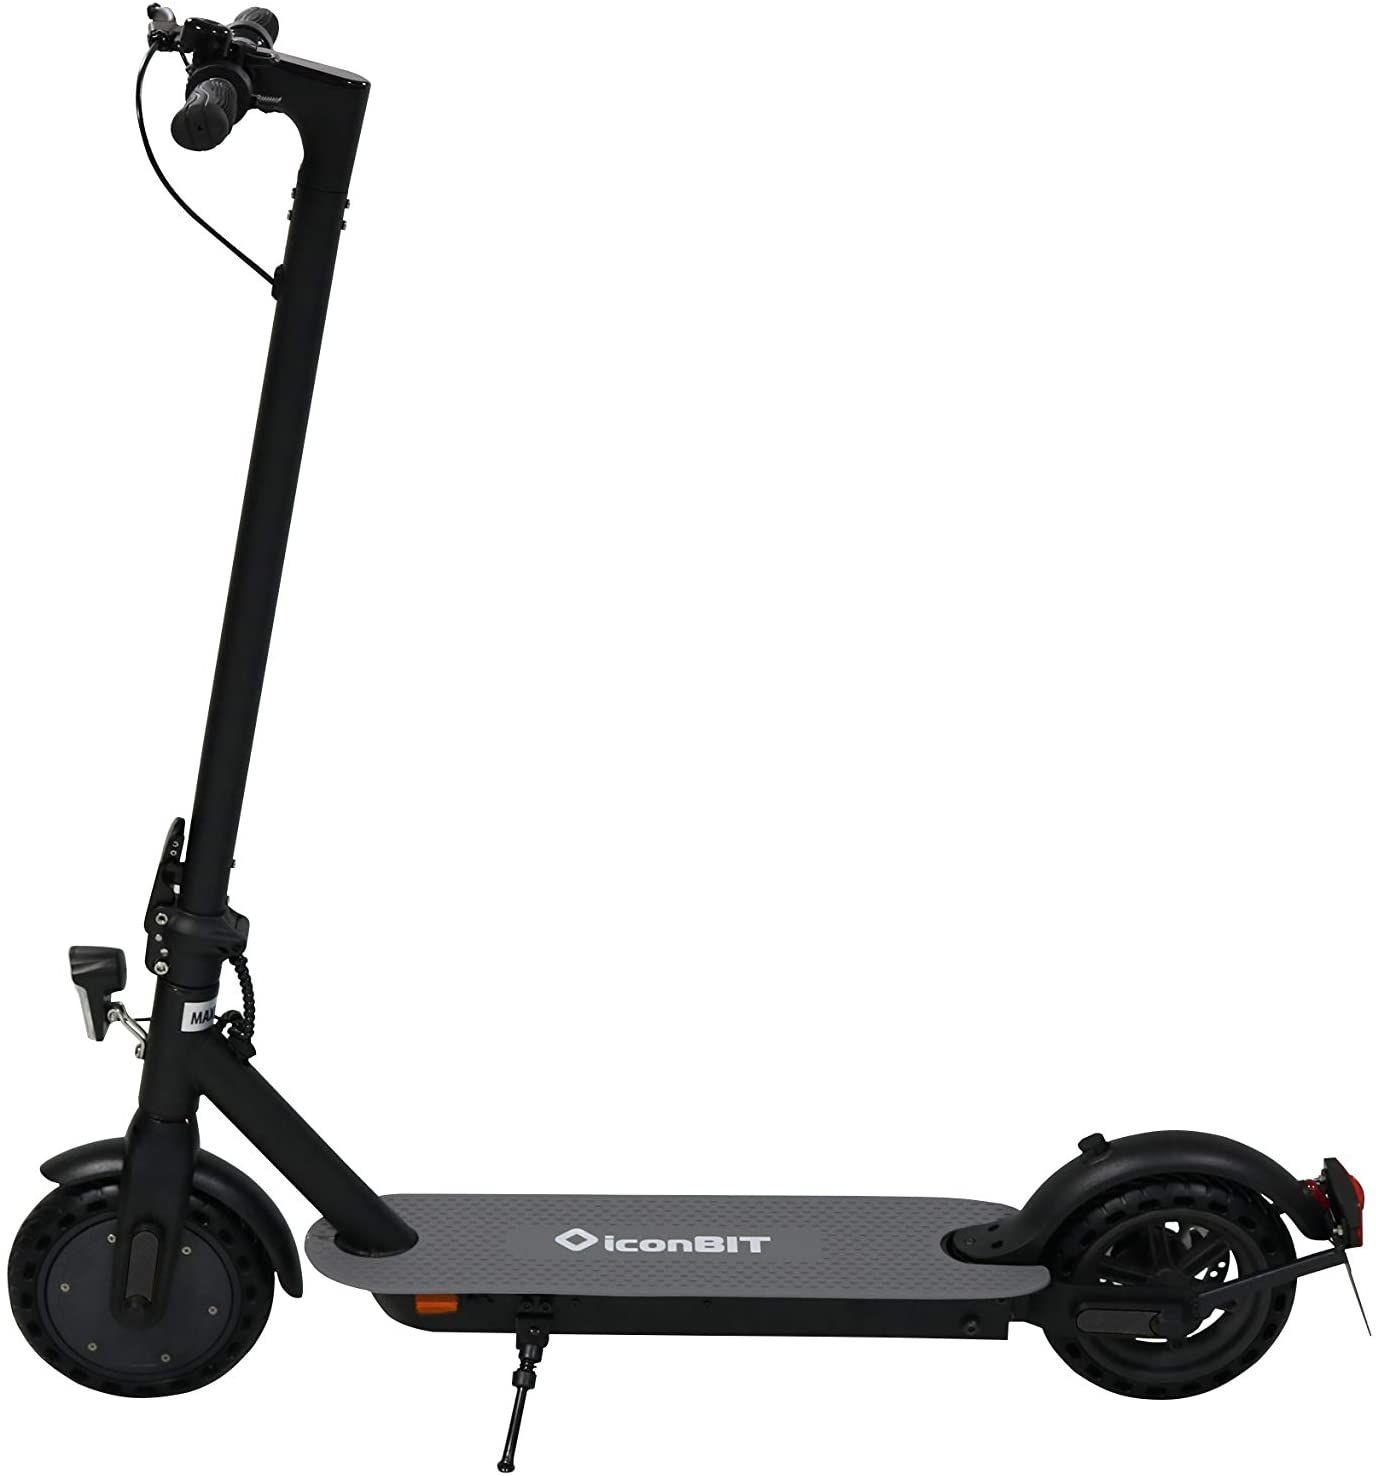 IconBit City Kick Scooter (StVO Zulassung, 20km Reichweite, 20km/h, 7.5Ah, 350W Leistung, 100kg belastbar) [V&V Amazon]